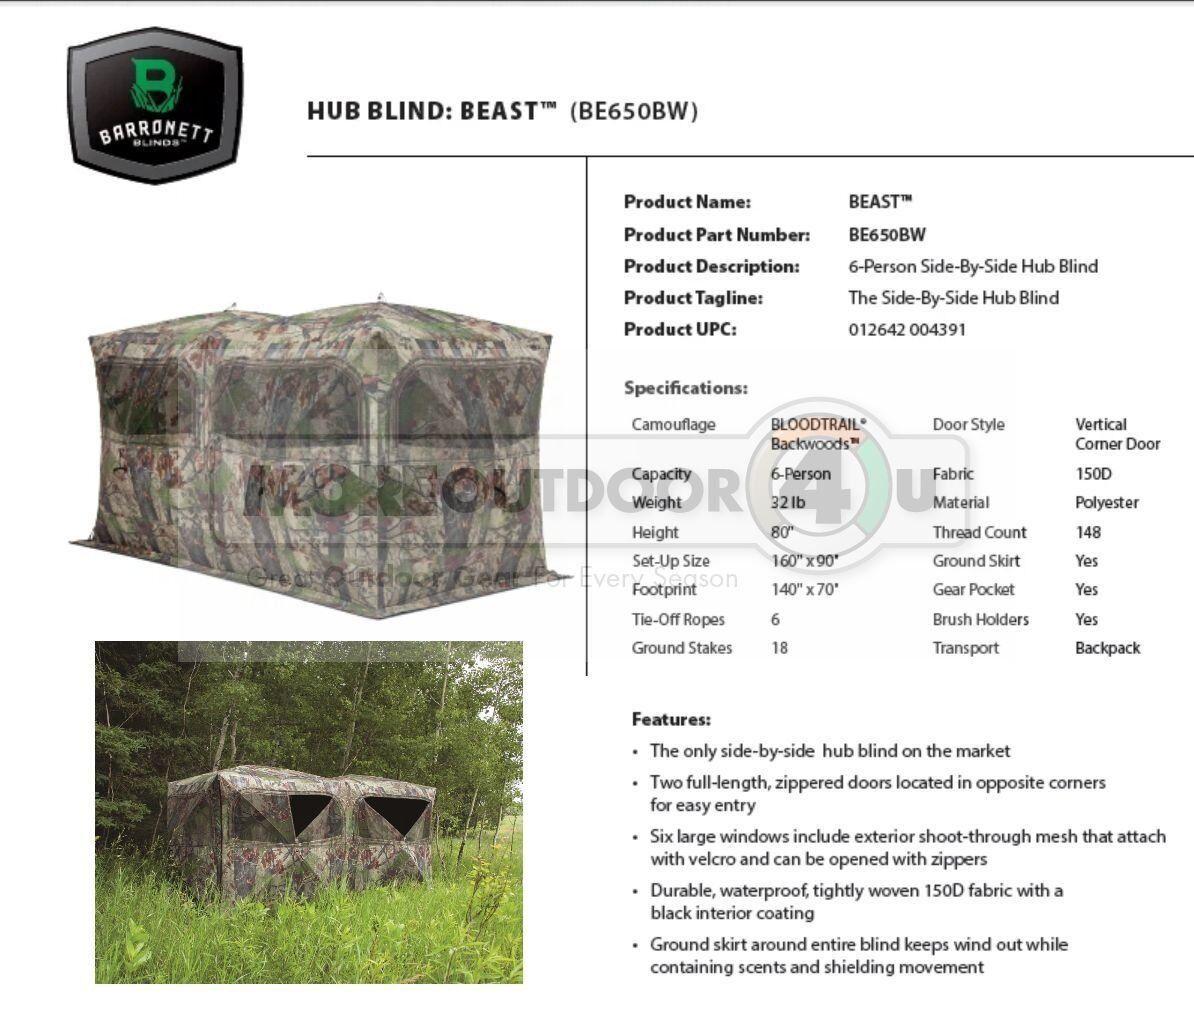 BE650BW Barronett Blinds la Besteia tierra caza ciego gran cazadores cabina ATV